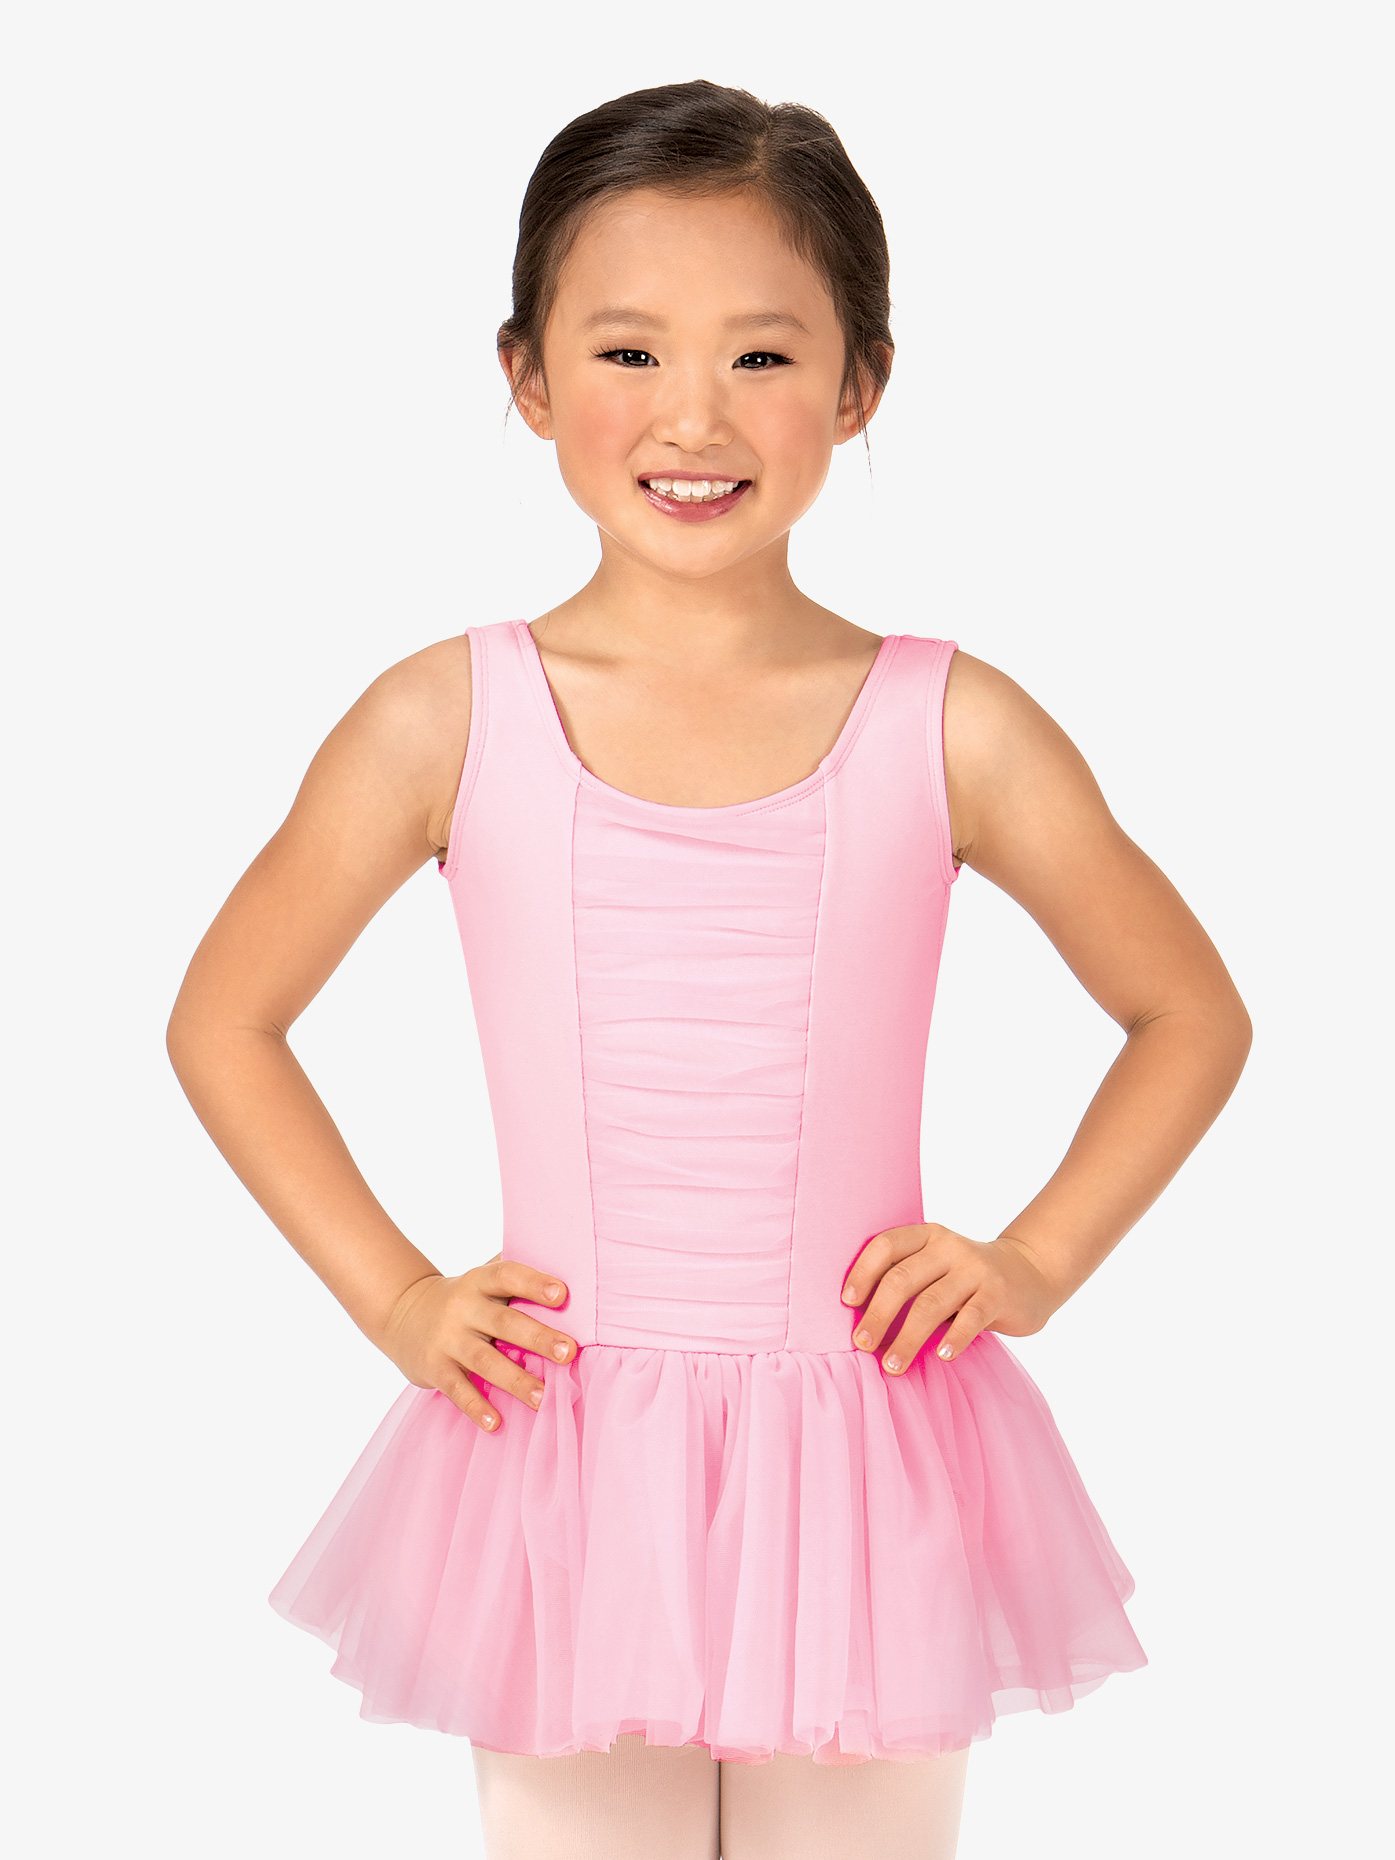 06517e834b46 Shirred Tank Dress - Ballet/Lyrical | Theatricals TH5523C ...